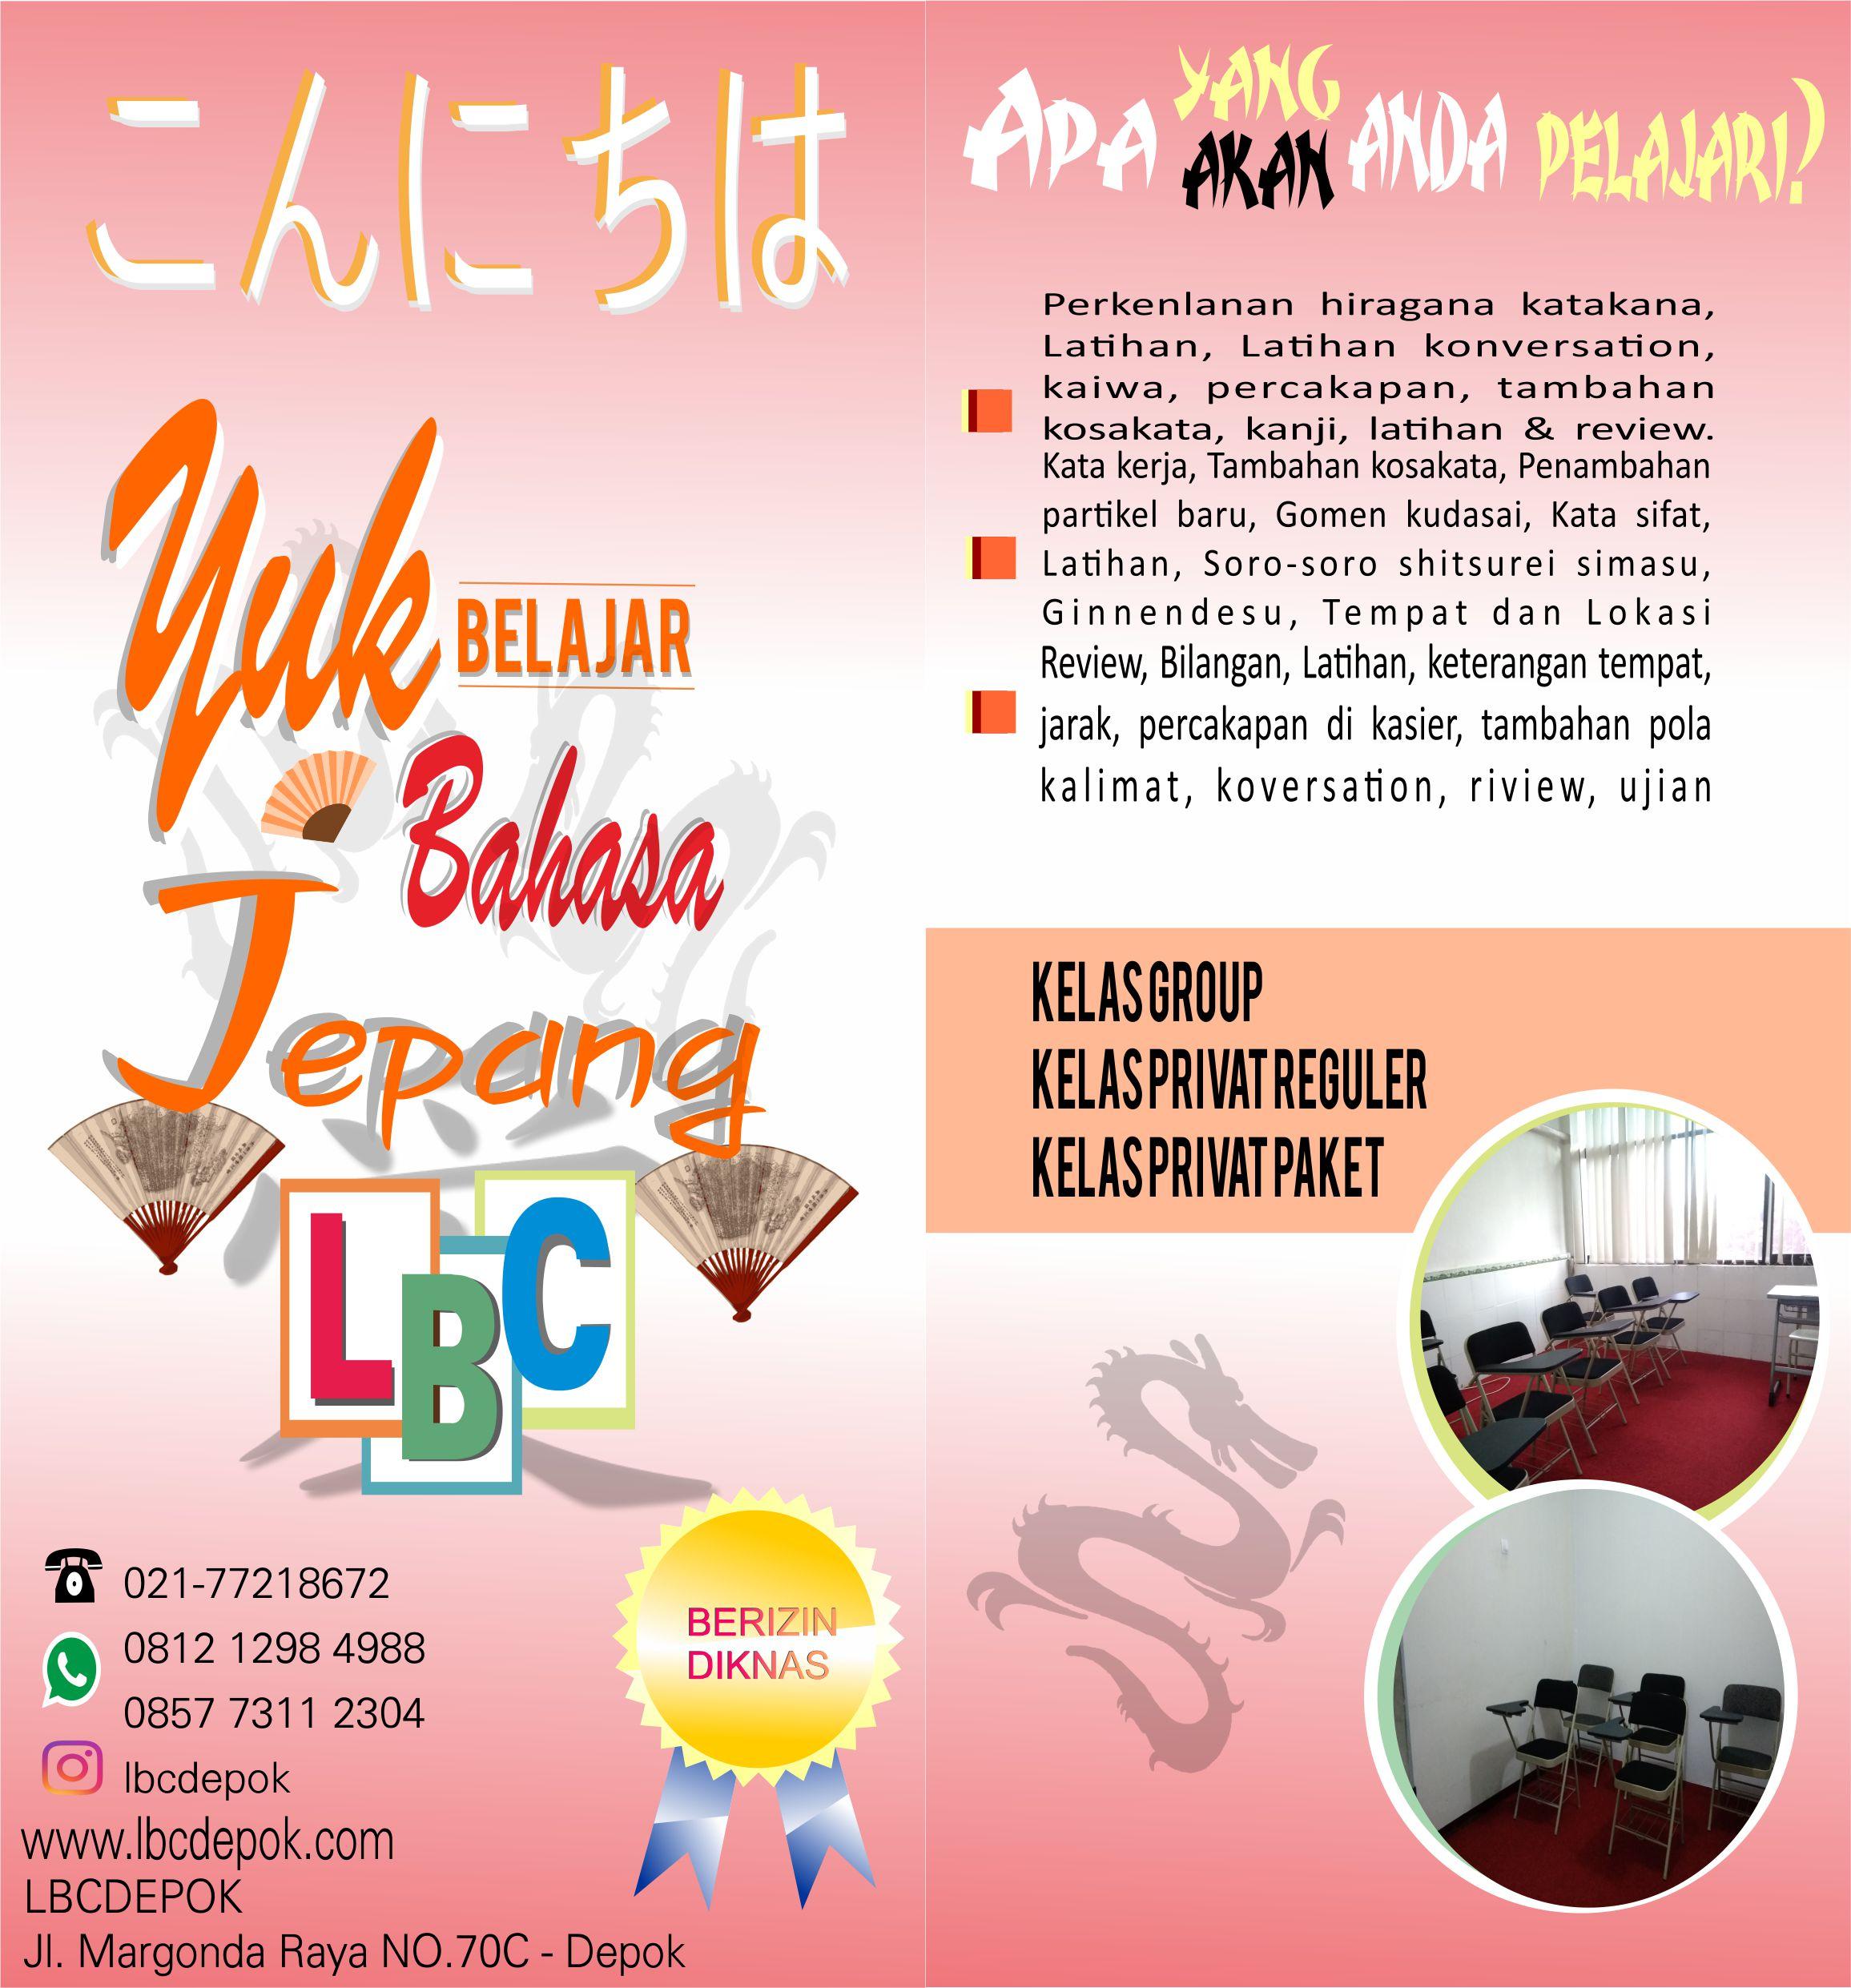 Program Bahasa Jepang